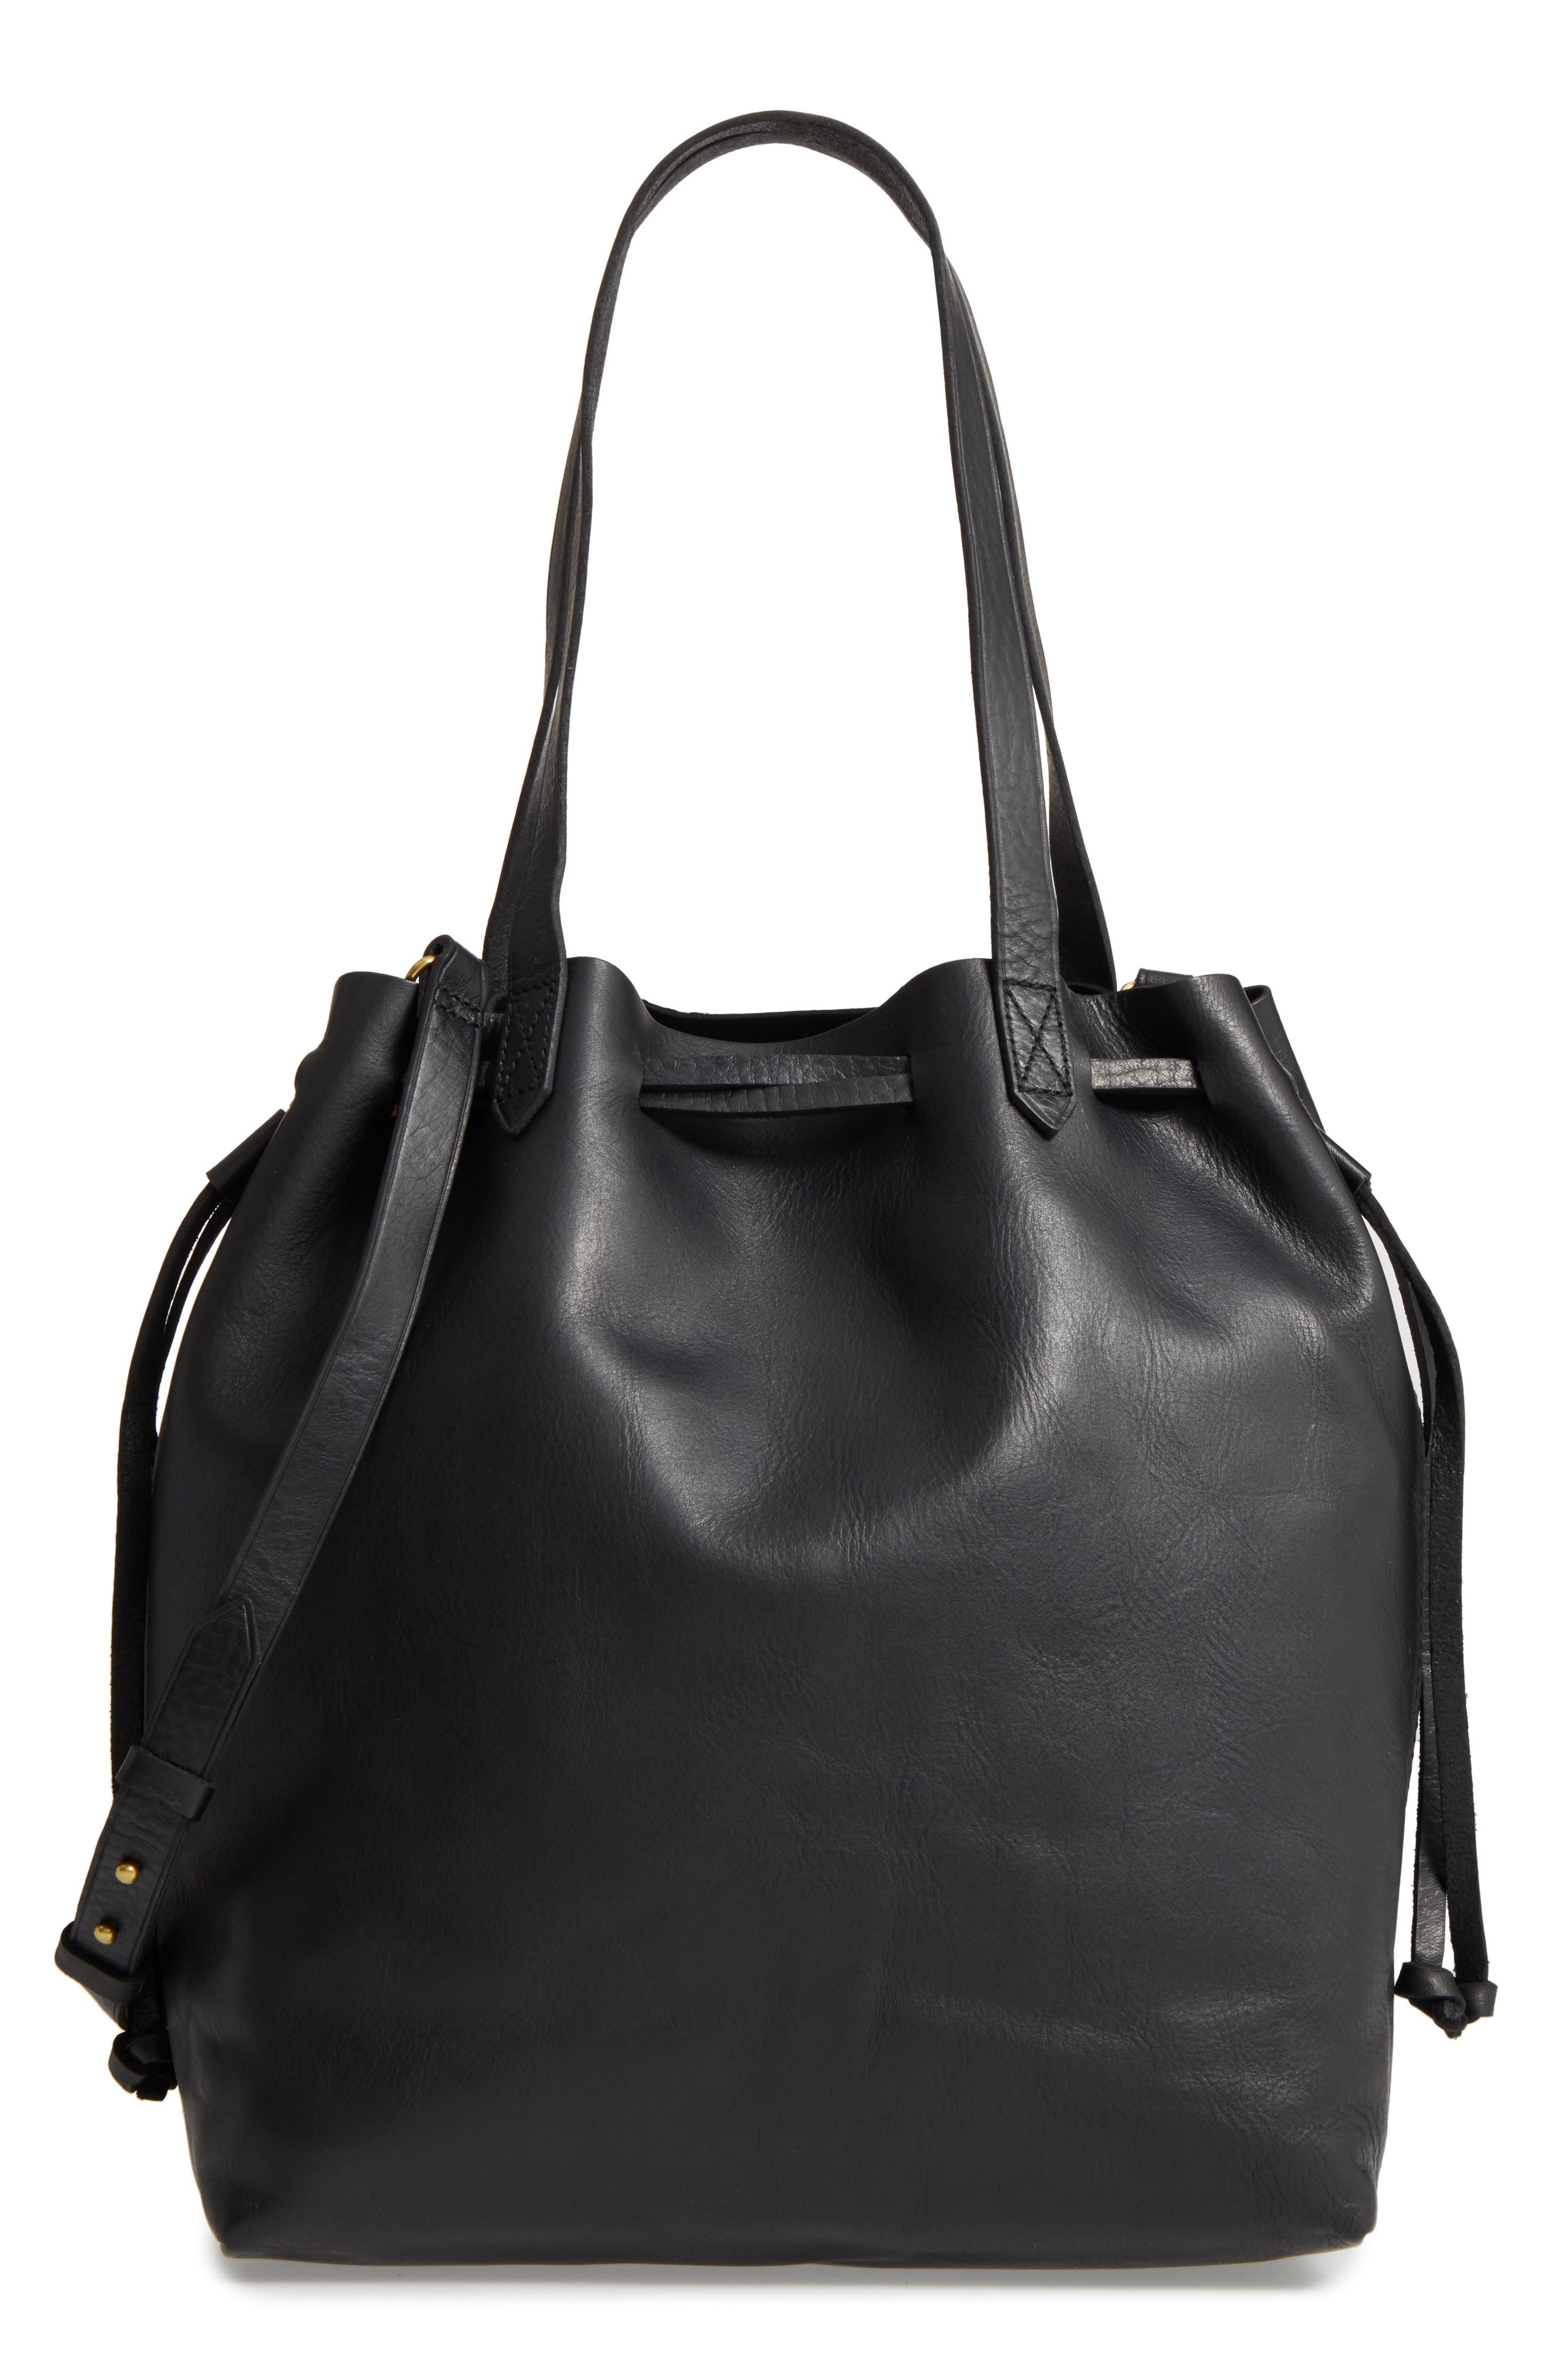 Medium Drawstring Transport Leather Tote,                         Main,                         color, TRUE BLACK